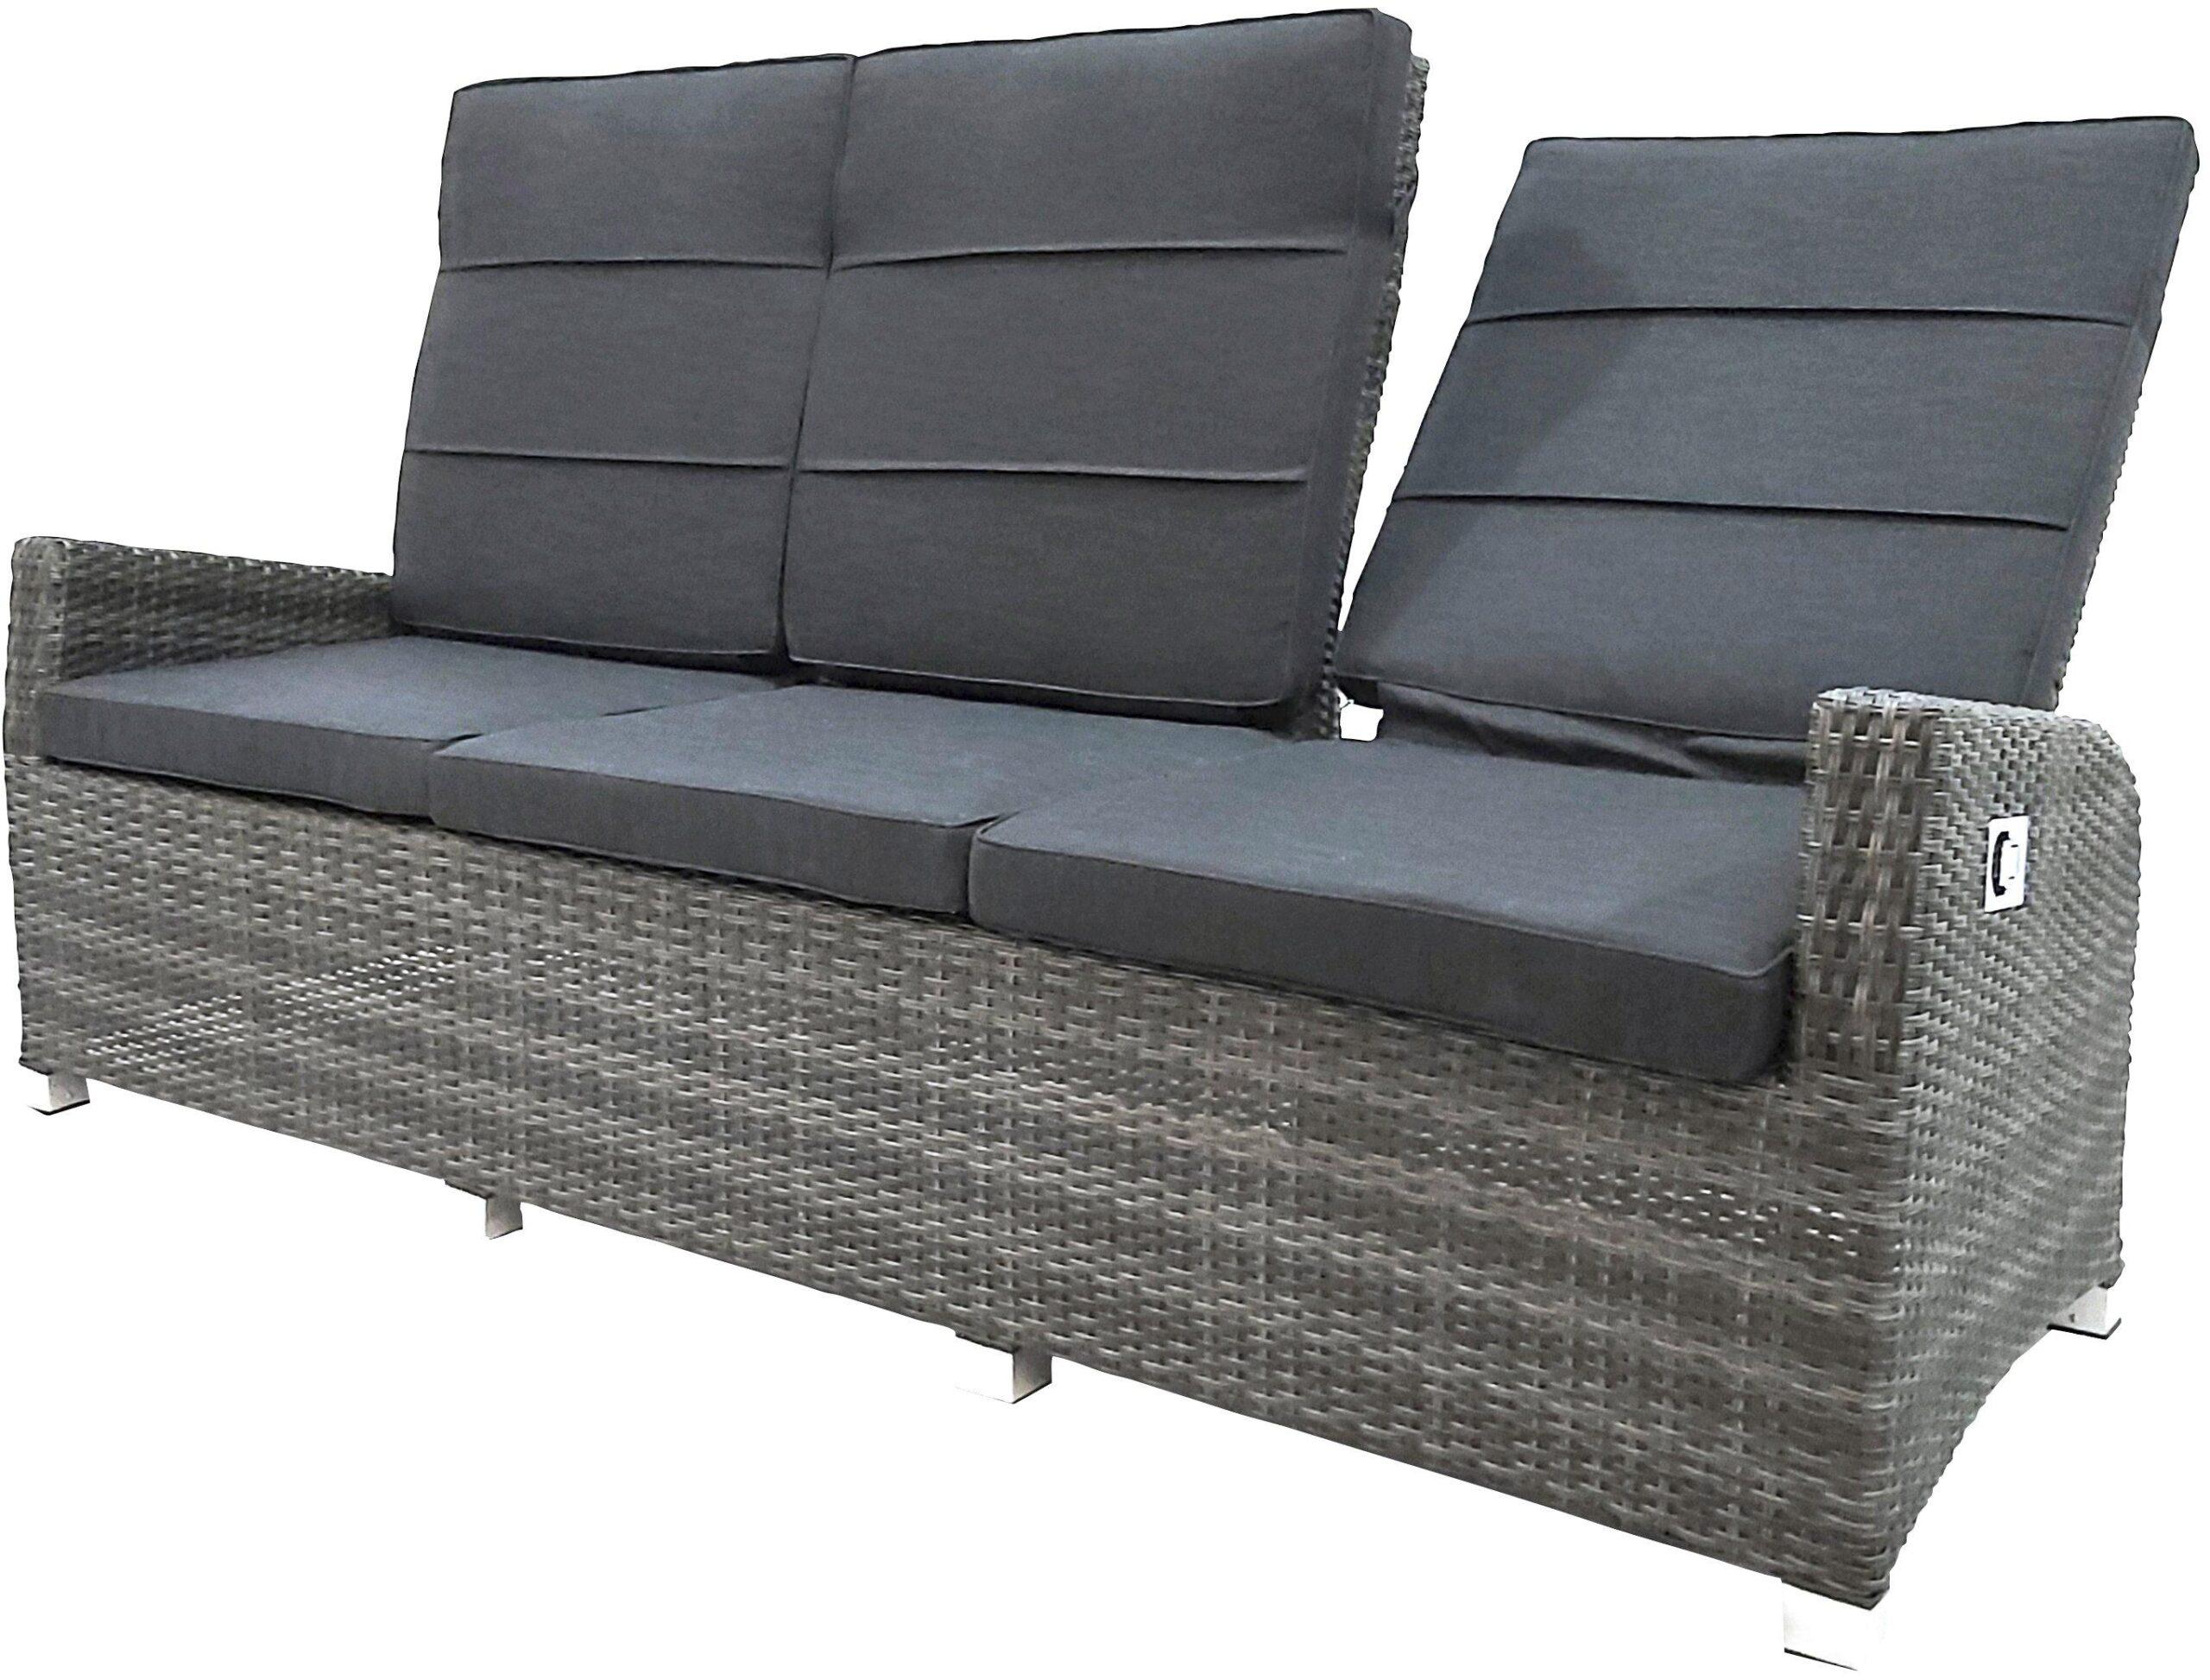 Full Size of Lounge Sofa Polyrattan Outdoor Ausziehbar Rattan Gartensofa 2 Sitzer Balkon Garden Set Couch 2 Sitzer Tchibo Grau Ploss Vigo Xxl Heimkino Sitzsack Schilling Sofa Polyrattan Sofa